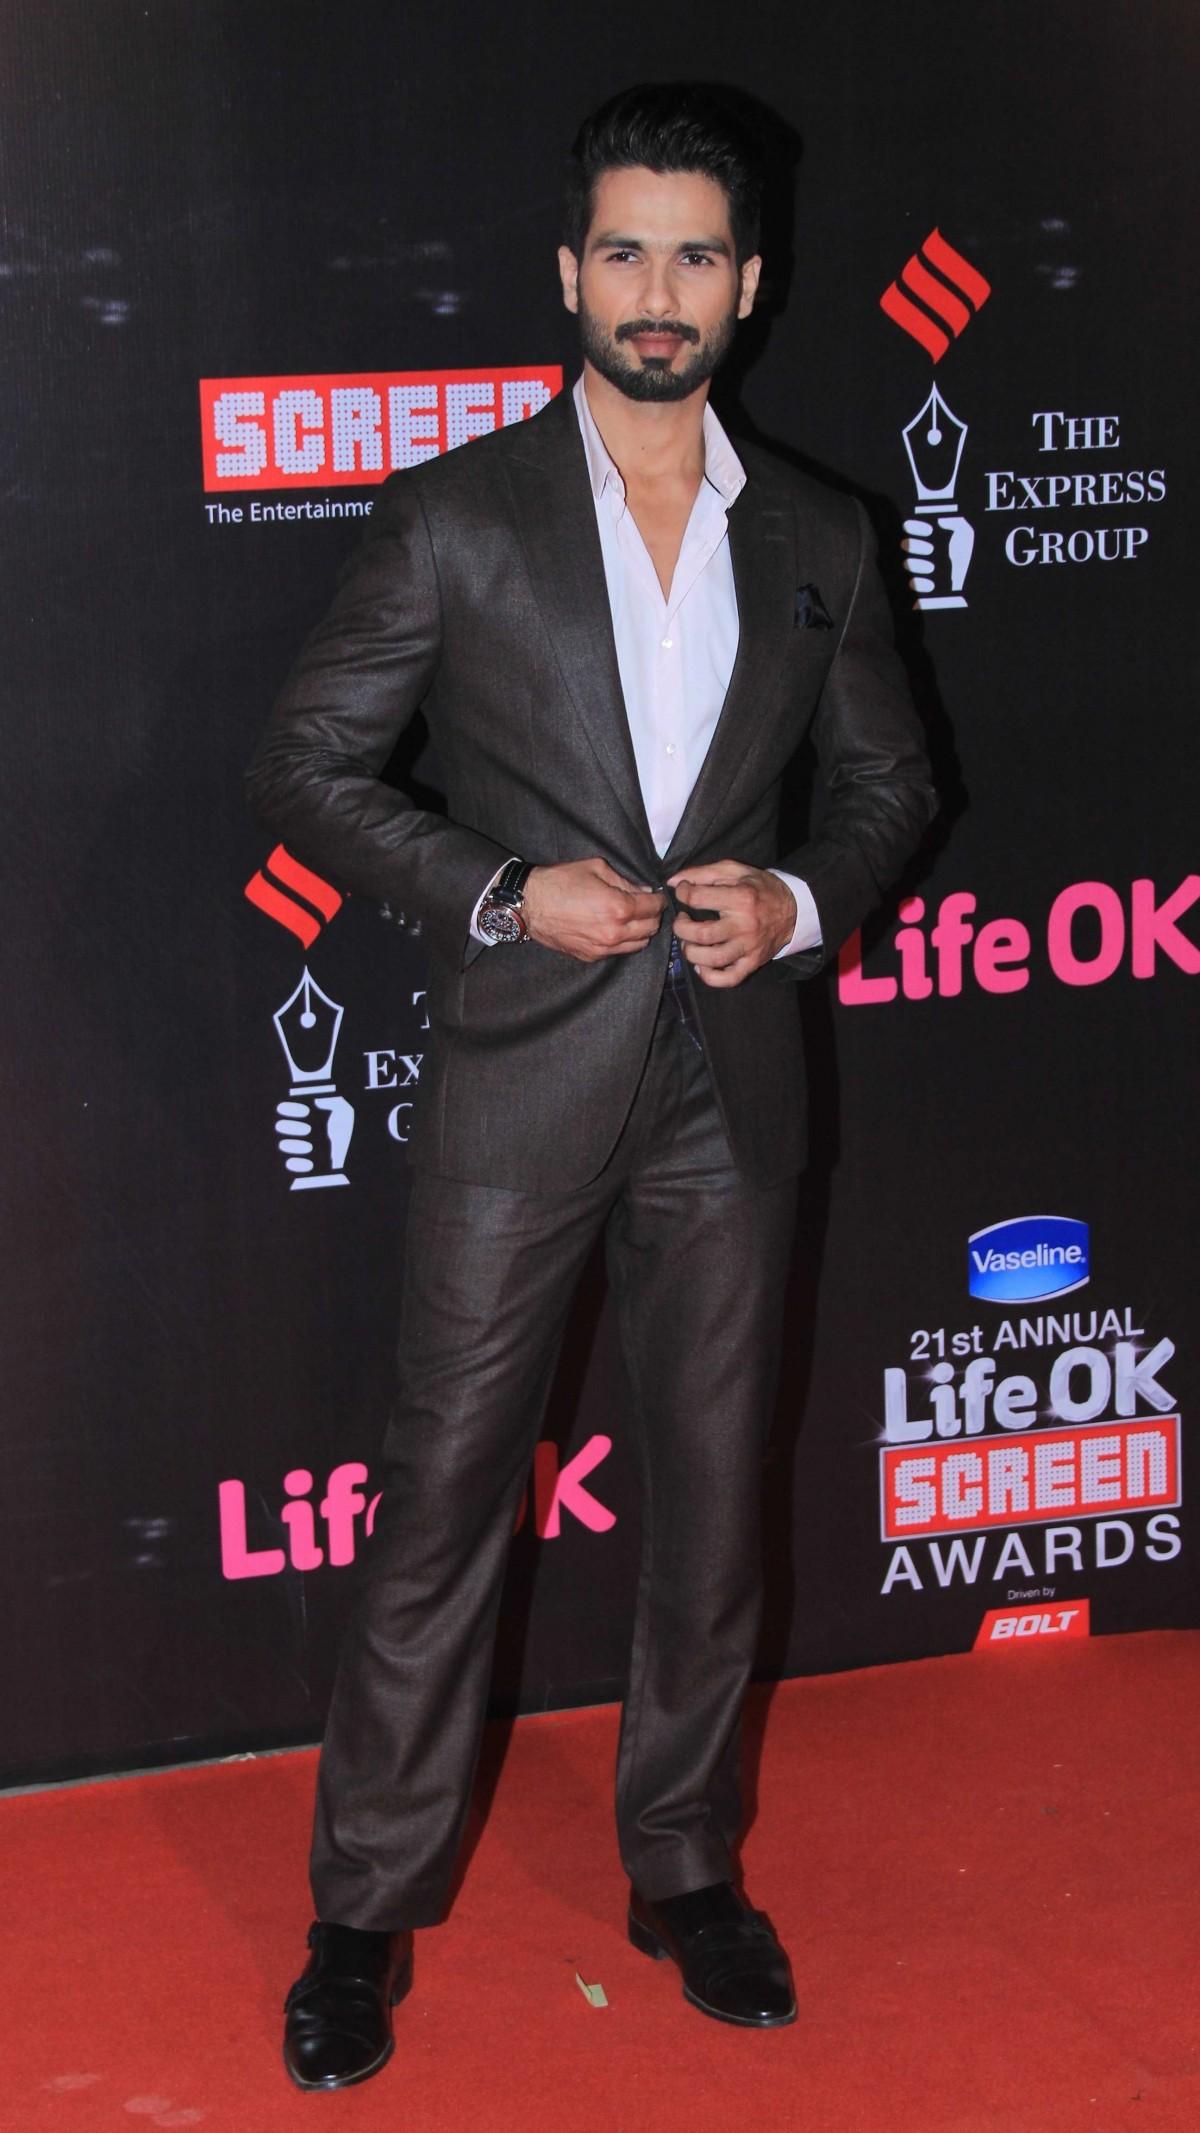 21st Life OK Screen Awards: Deepika Padukone, Priyanka Chopra, Shahid Kapoor and Other Stars Walk the Red Carpet